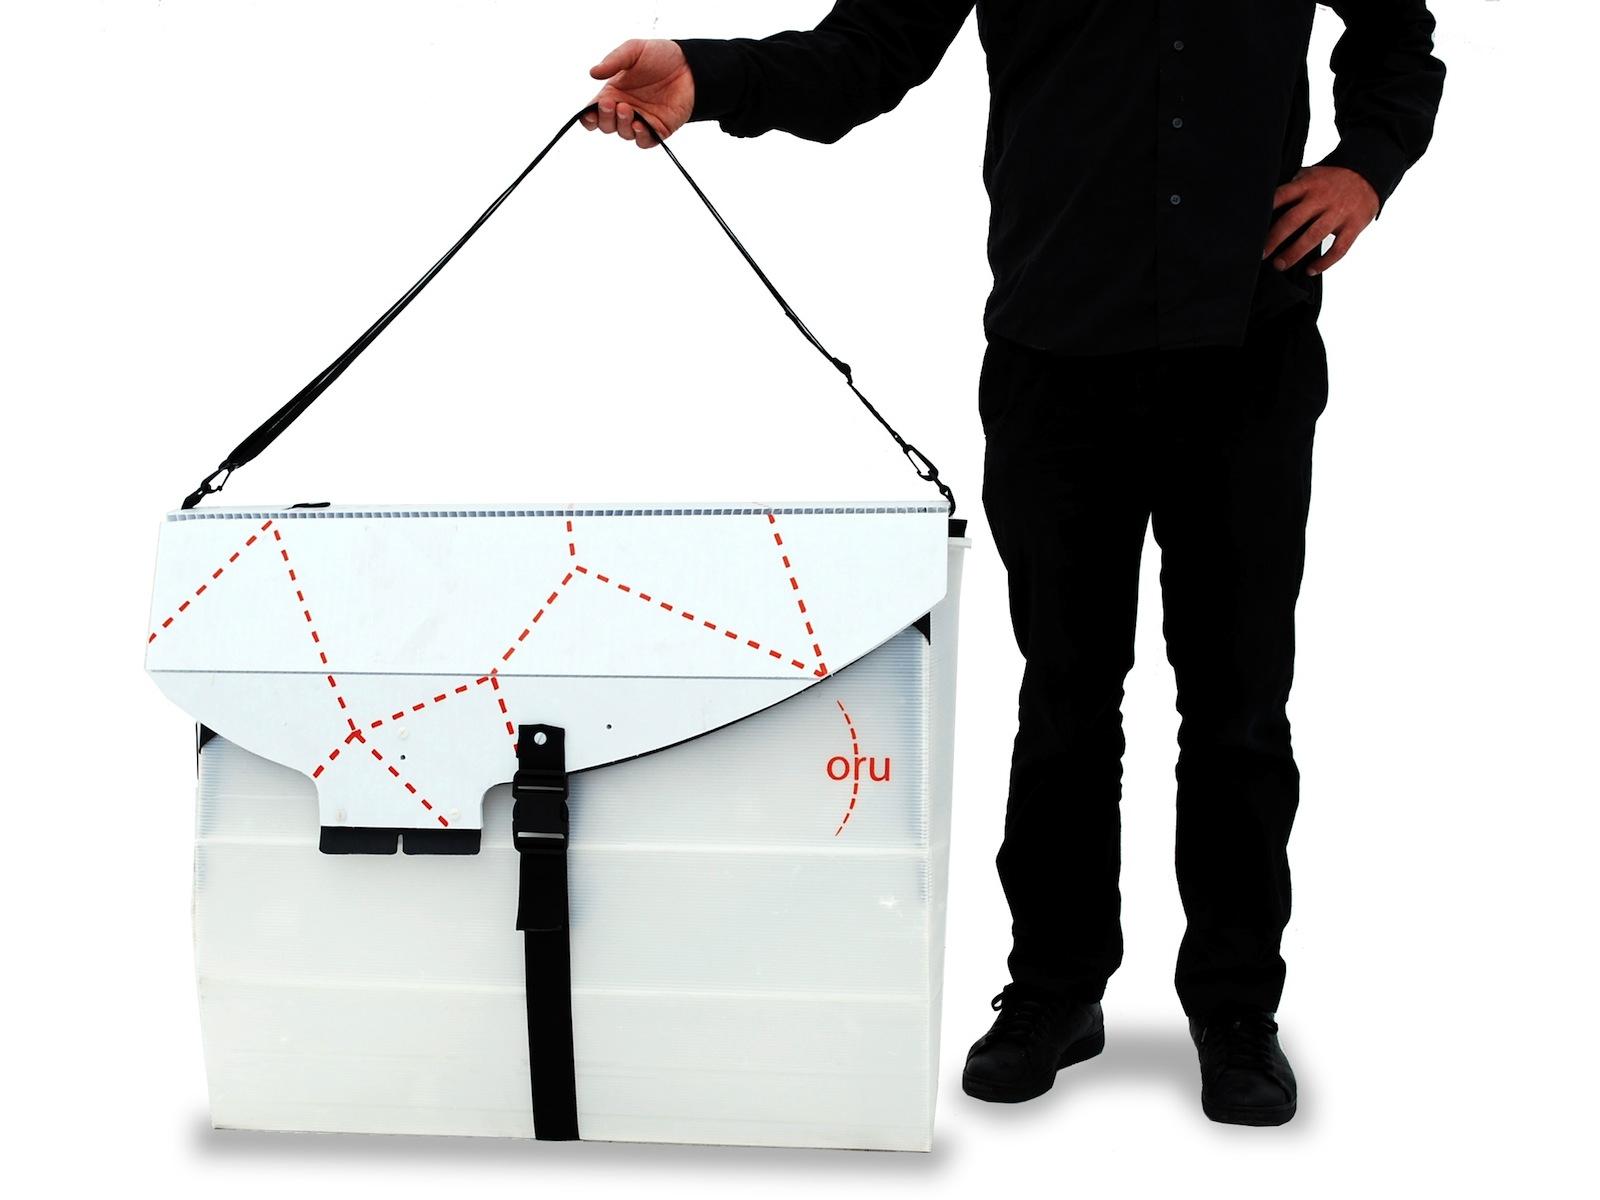 ORU, Origami Kayak